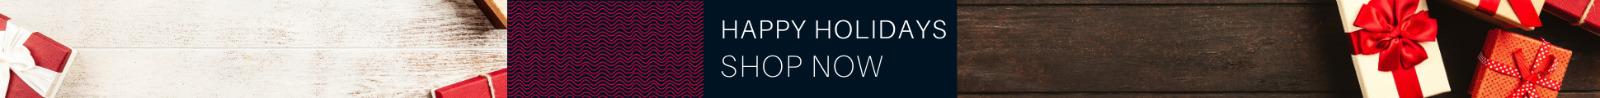 Happy Holidays Shop